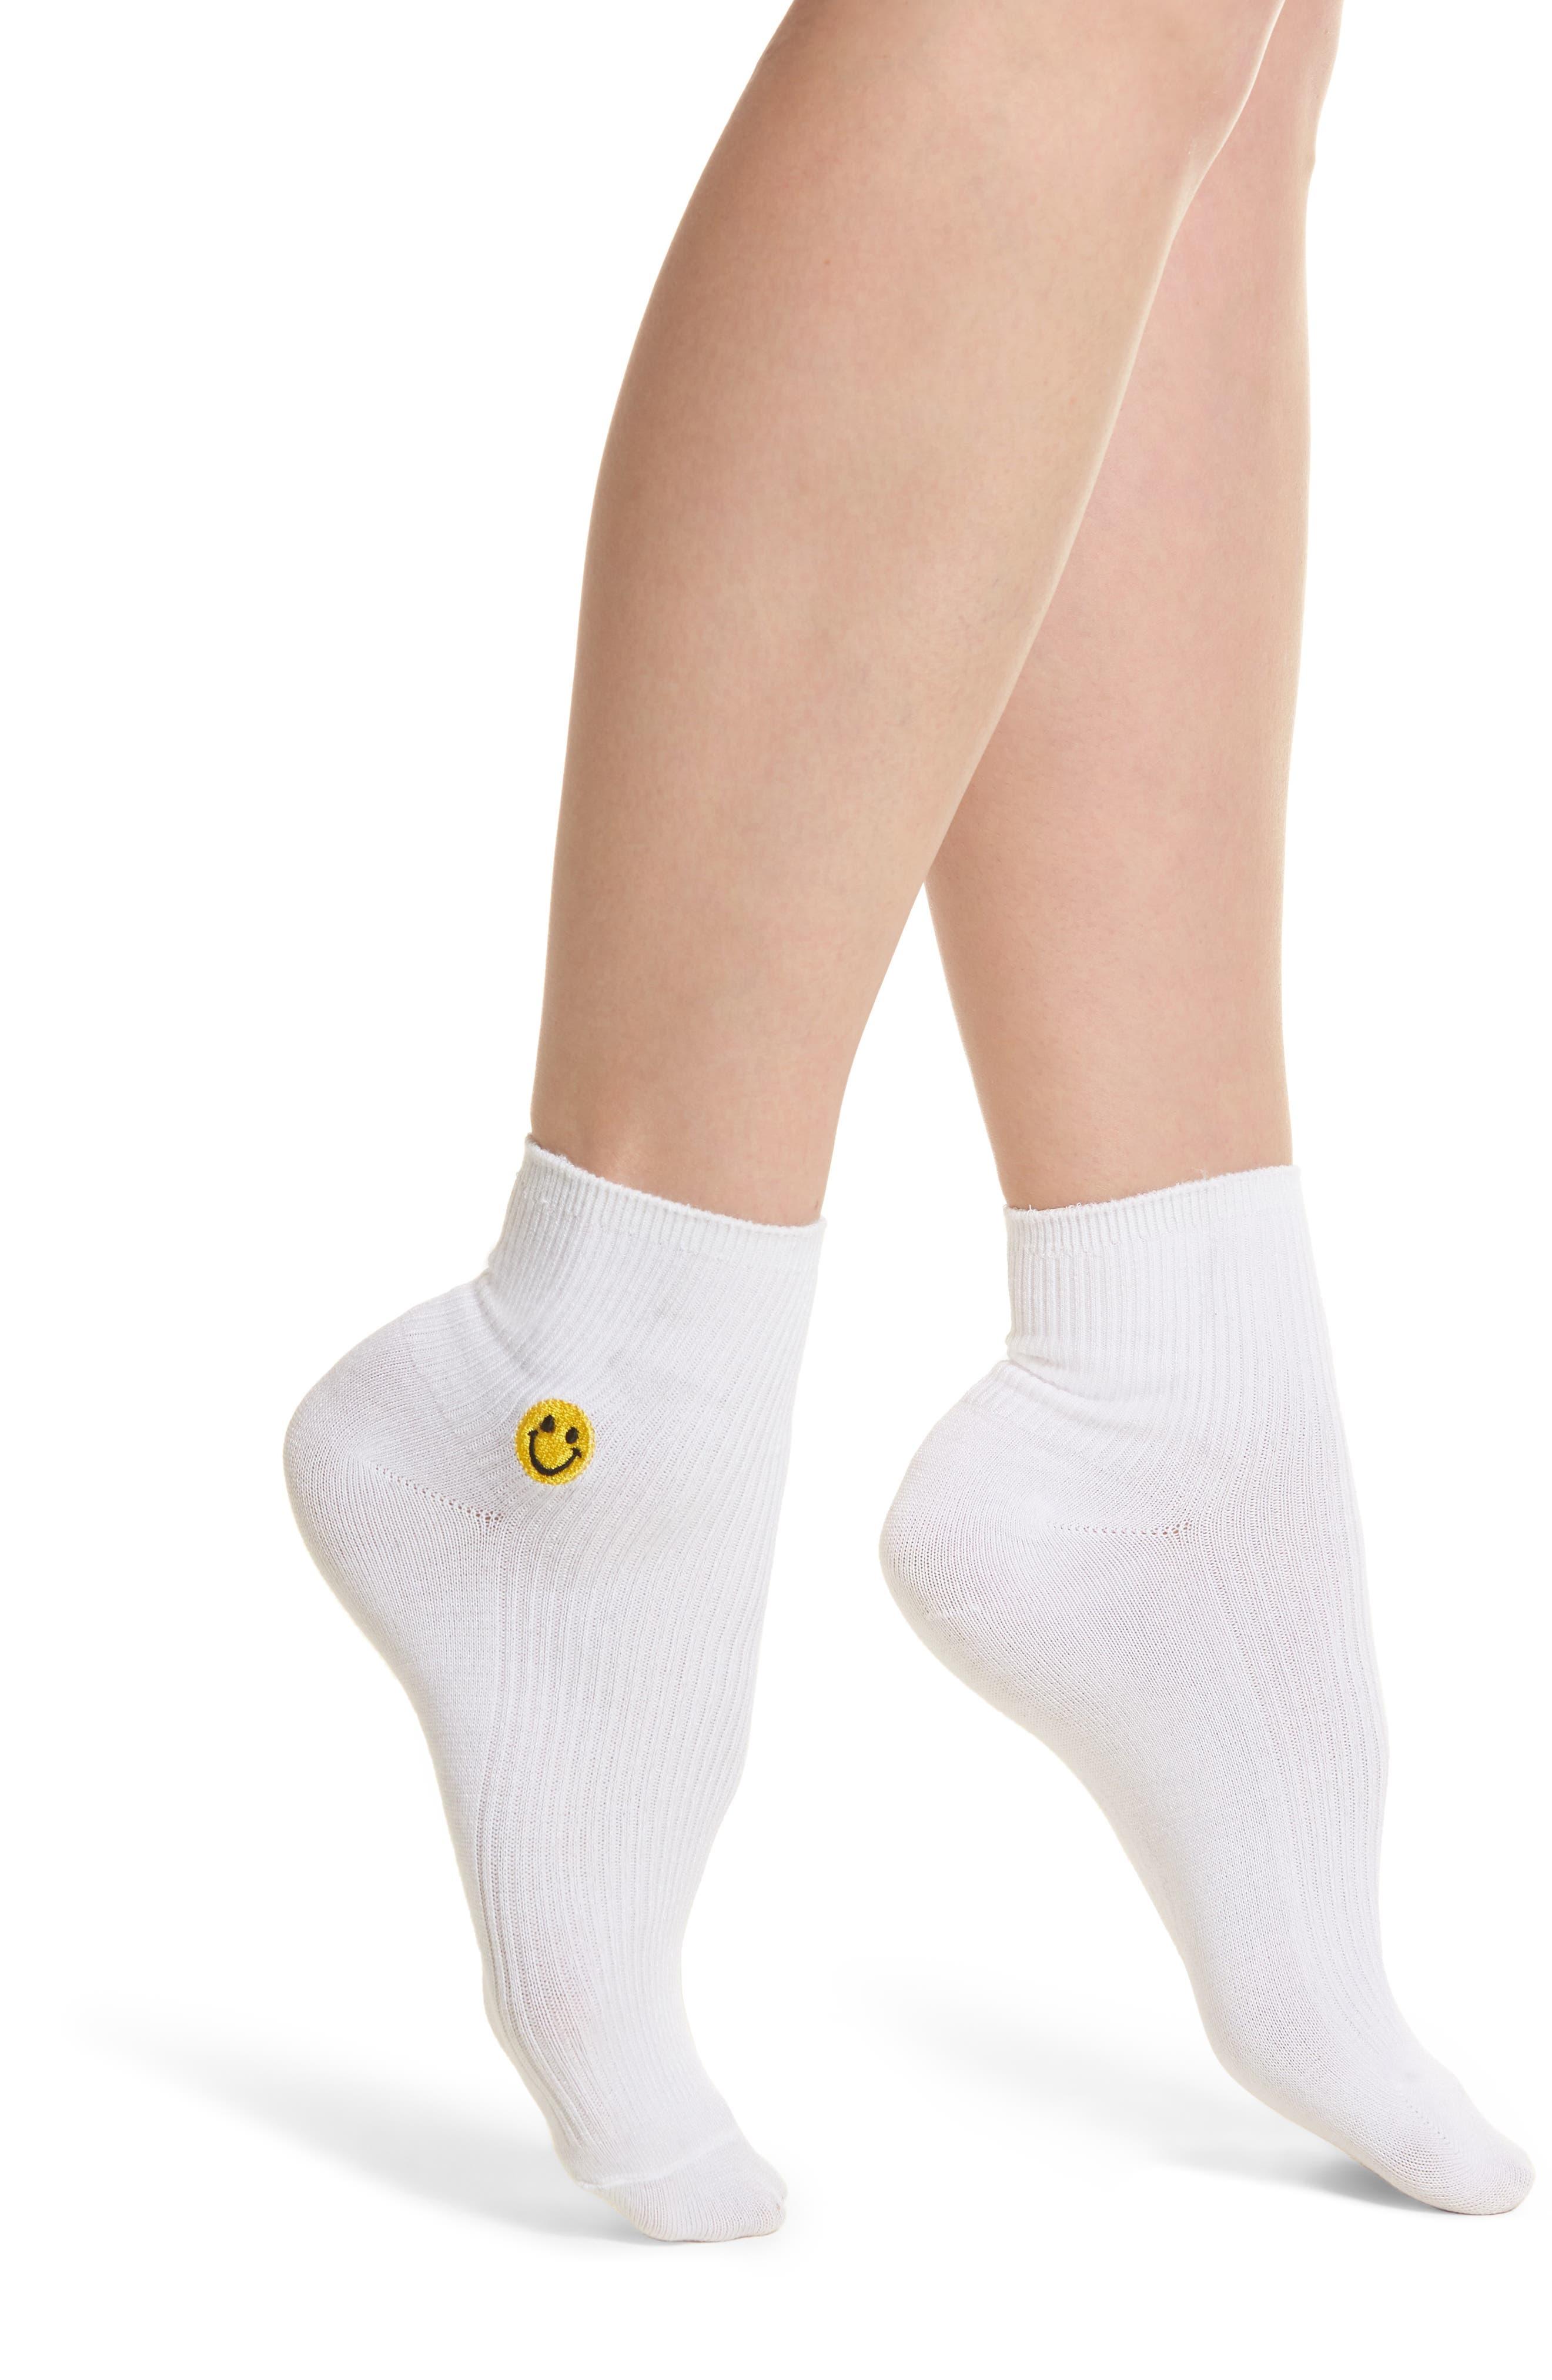 Smiles Ankle Socks,                         Main,                         color,